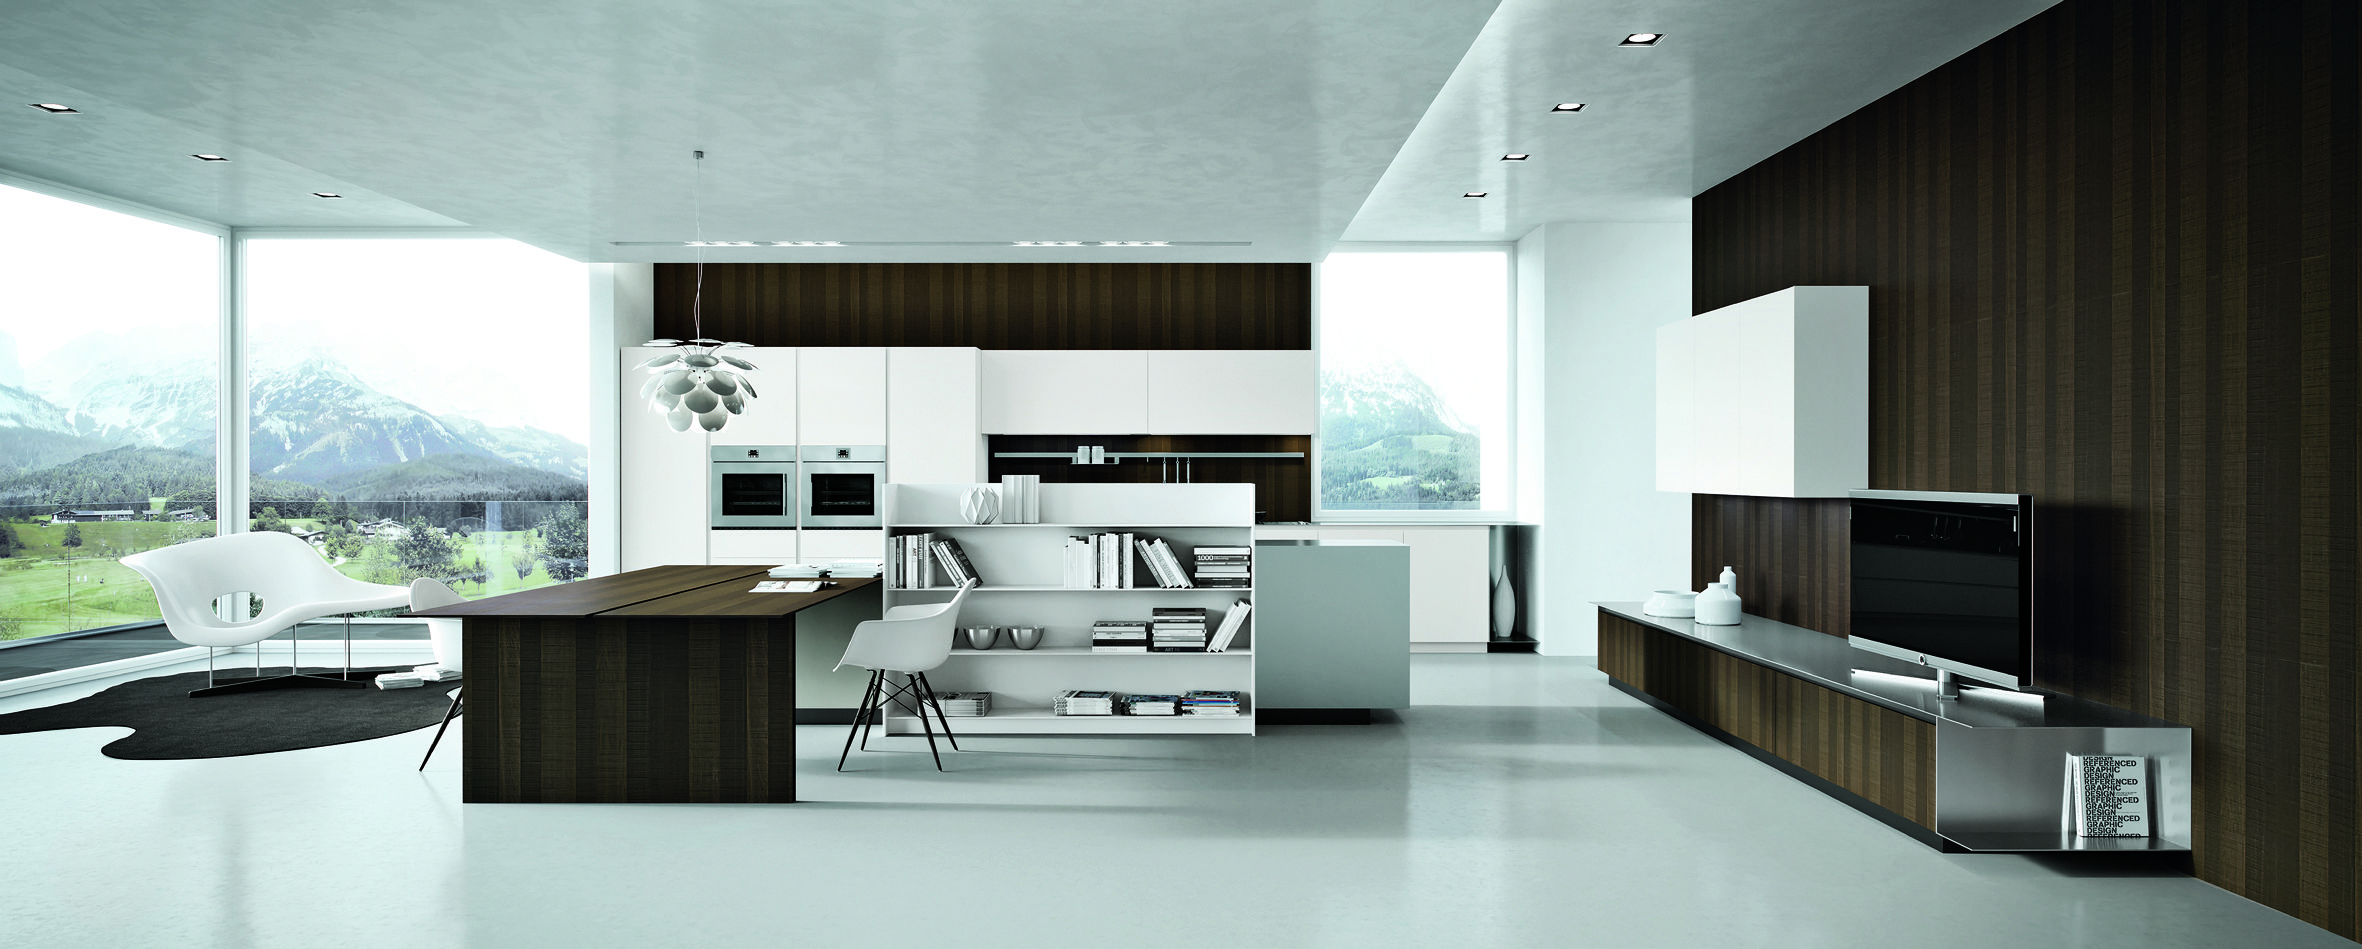 Arrital #kitchen #eco #design #paperstone | Home Design | Pinterest